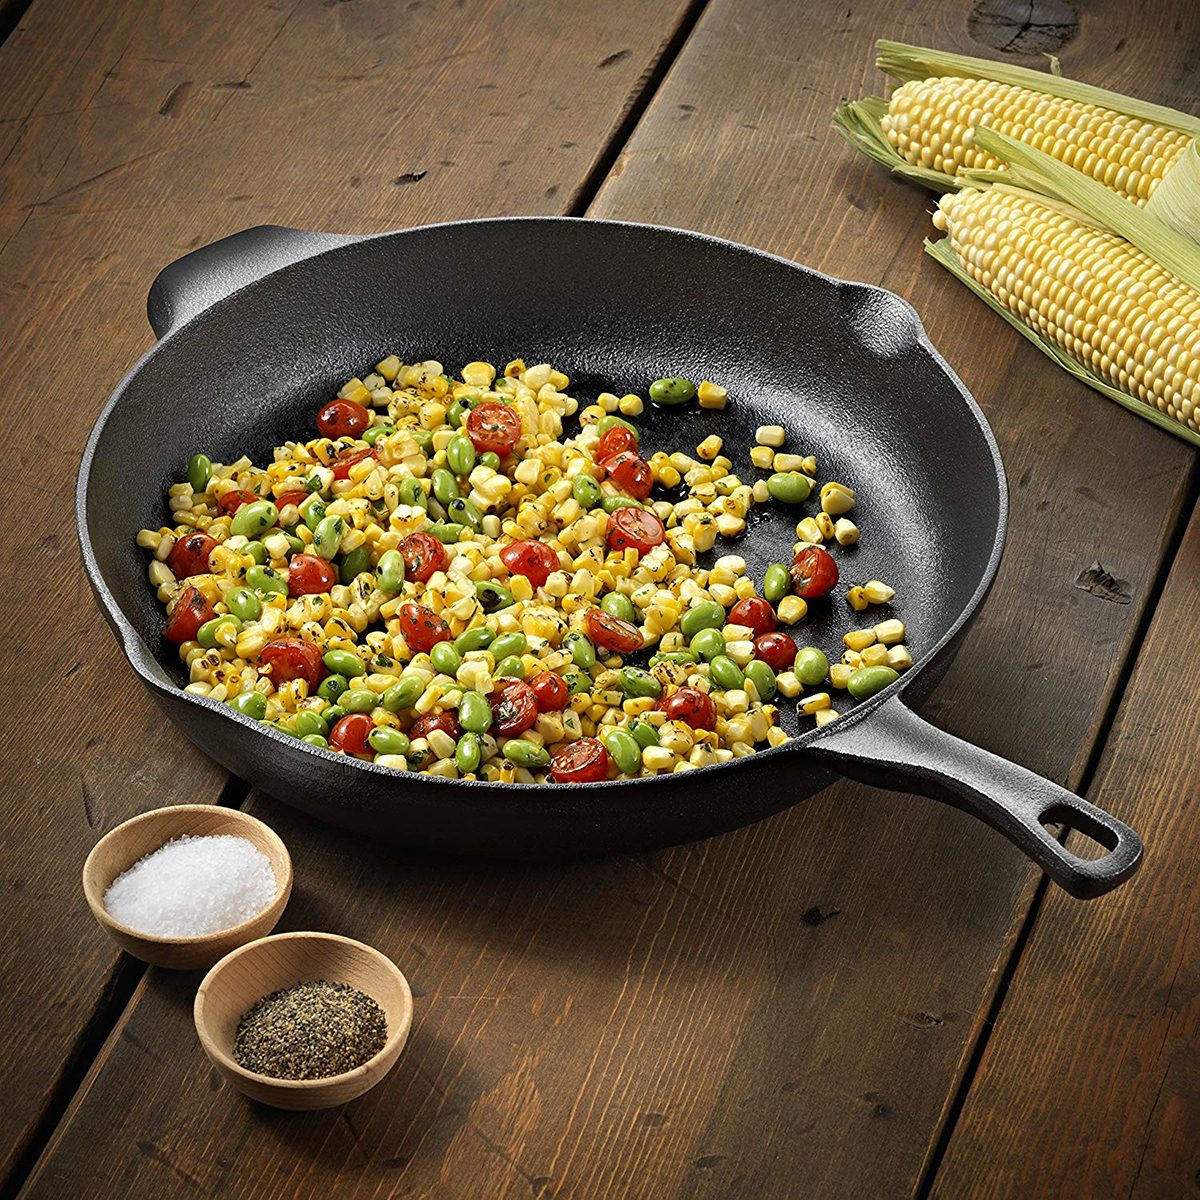 Calphalon Pre-Seasoned Cast Iron Cookware, Skillet, 12-inch